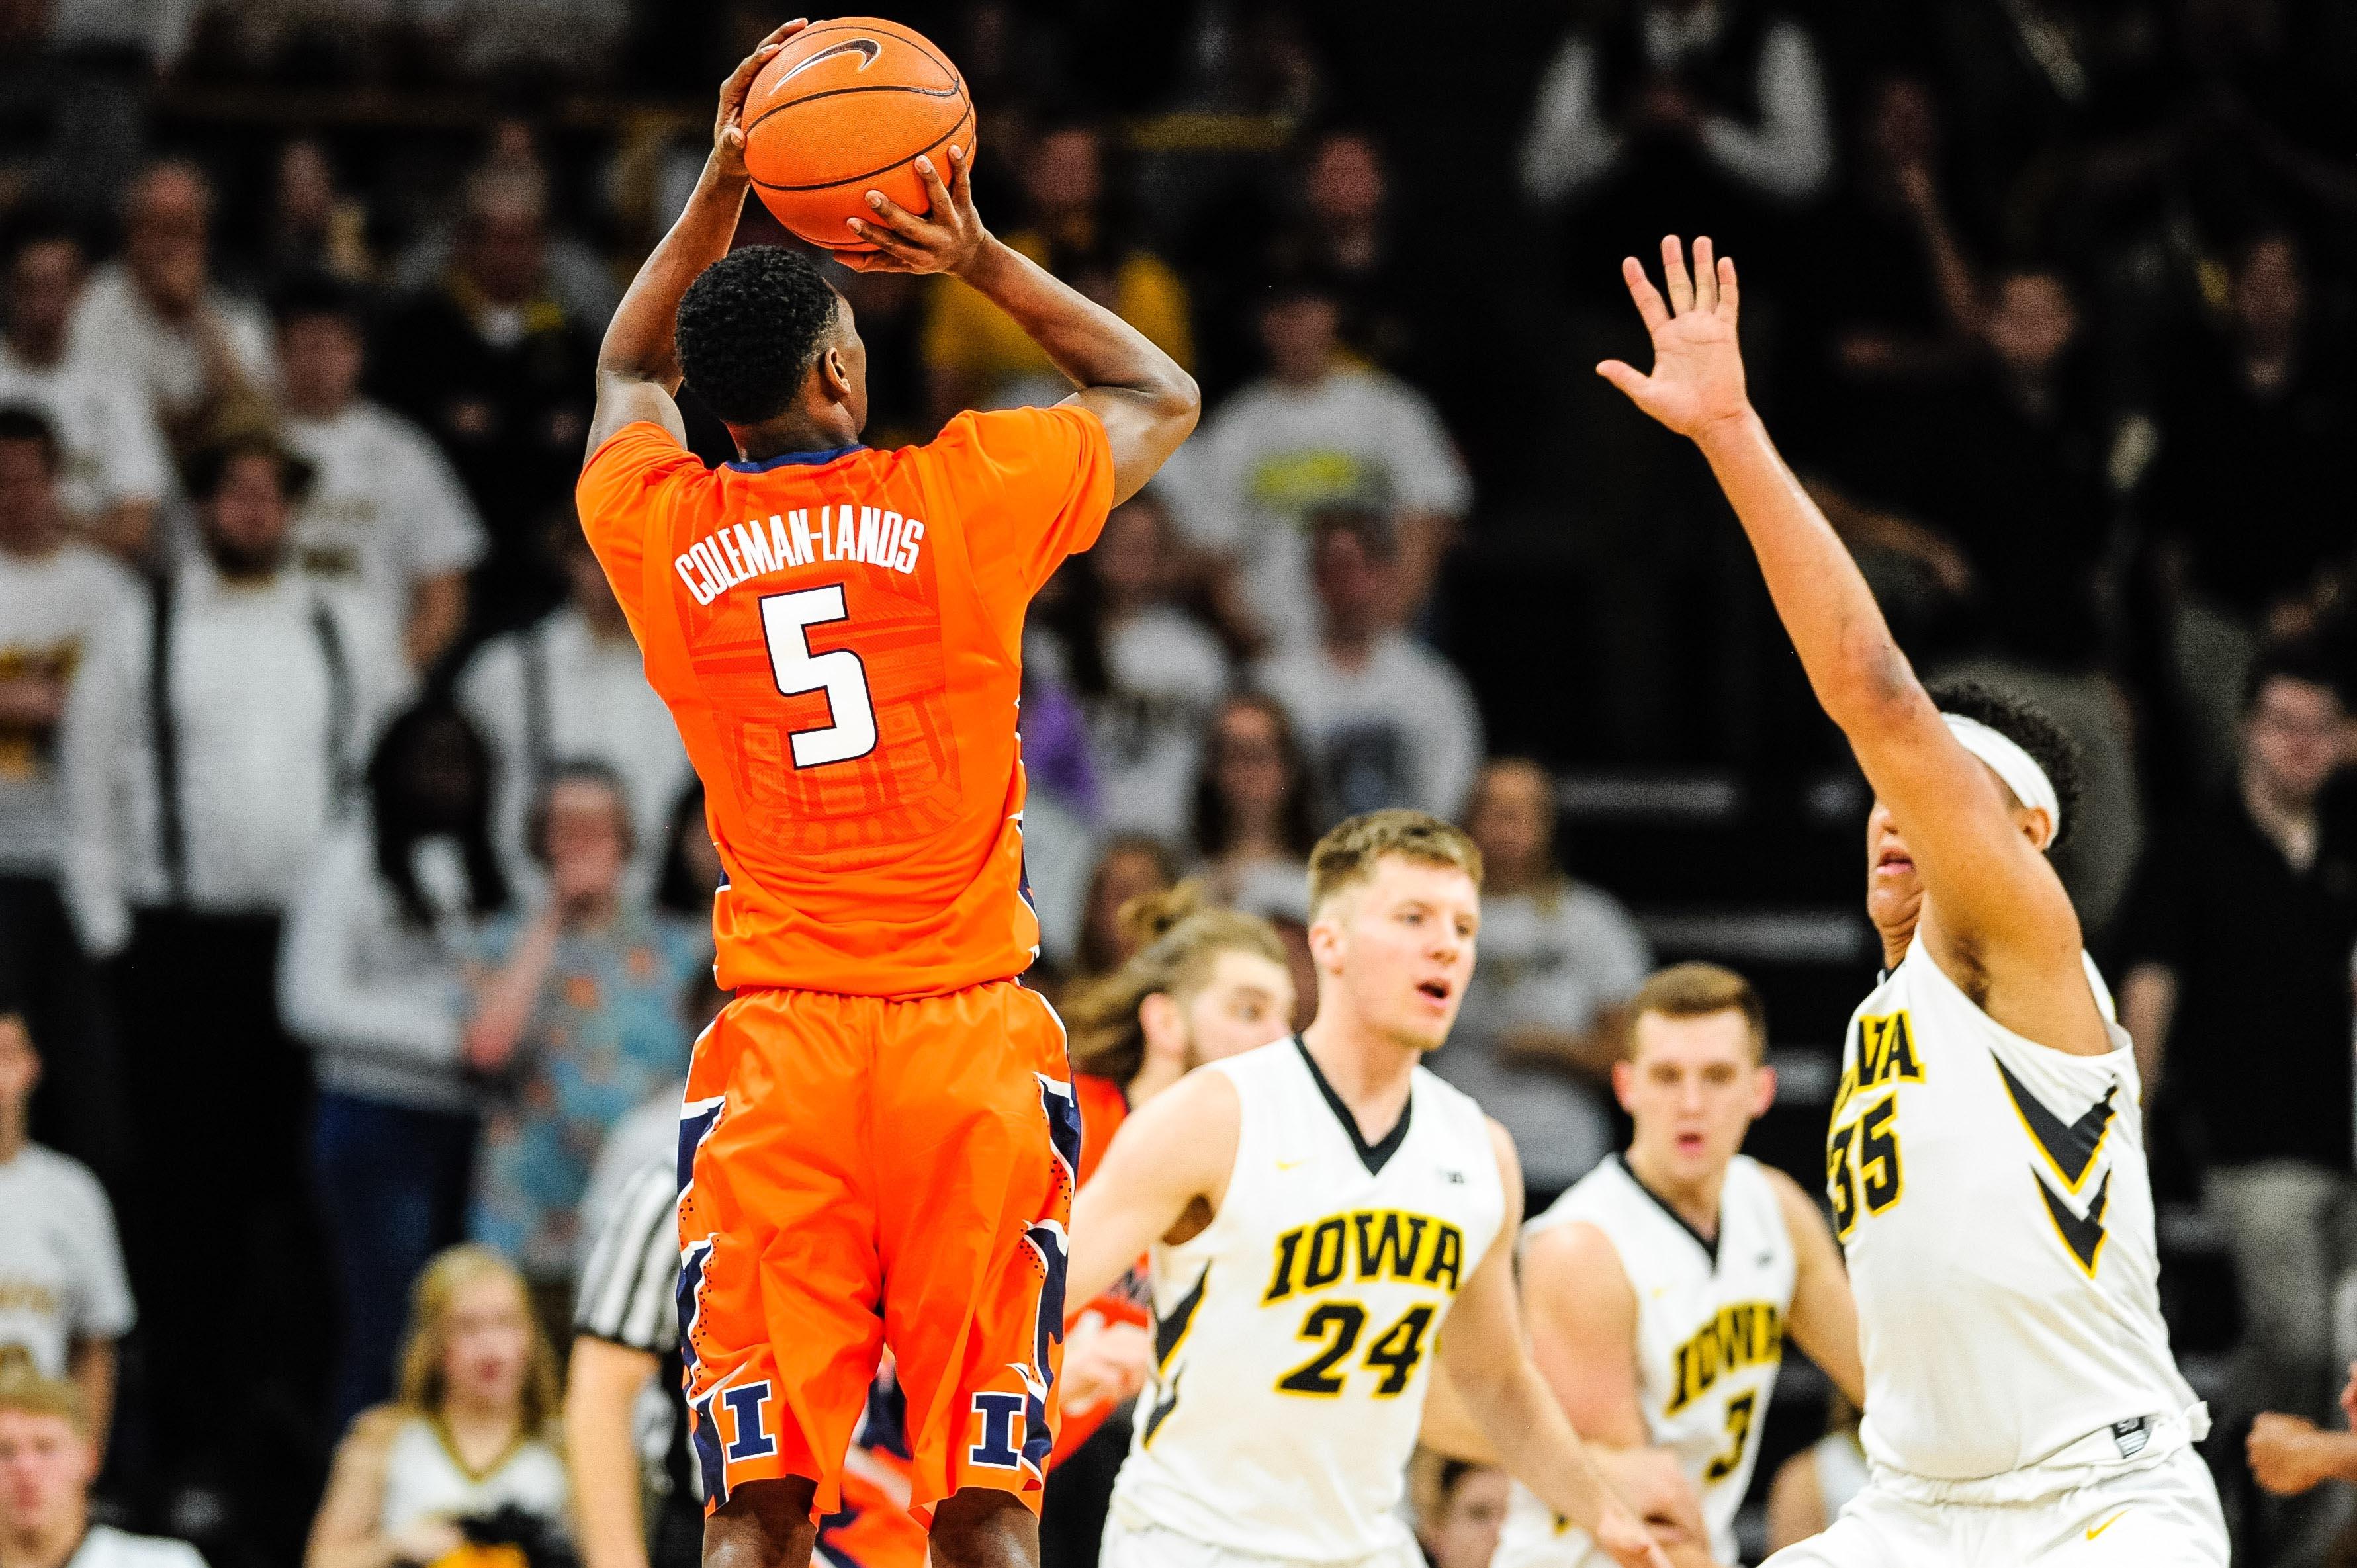 iowa basketball - photo #35